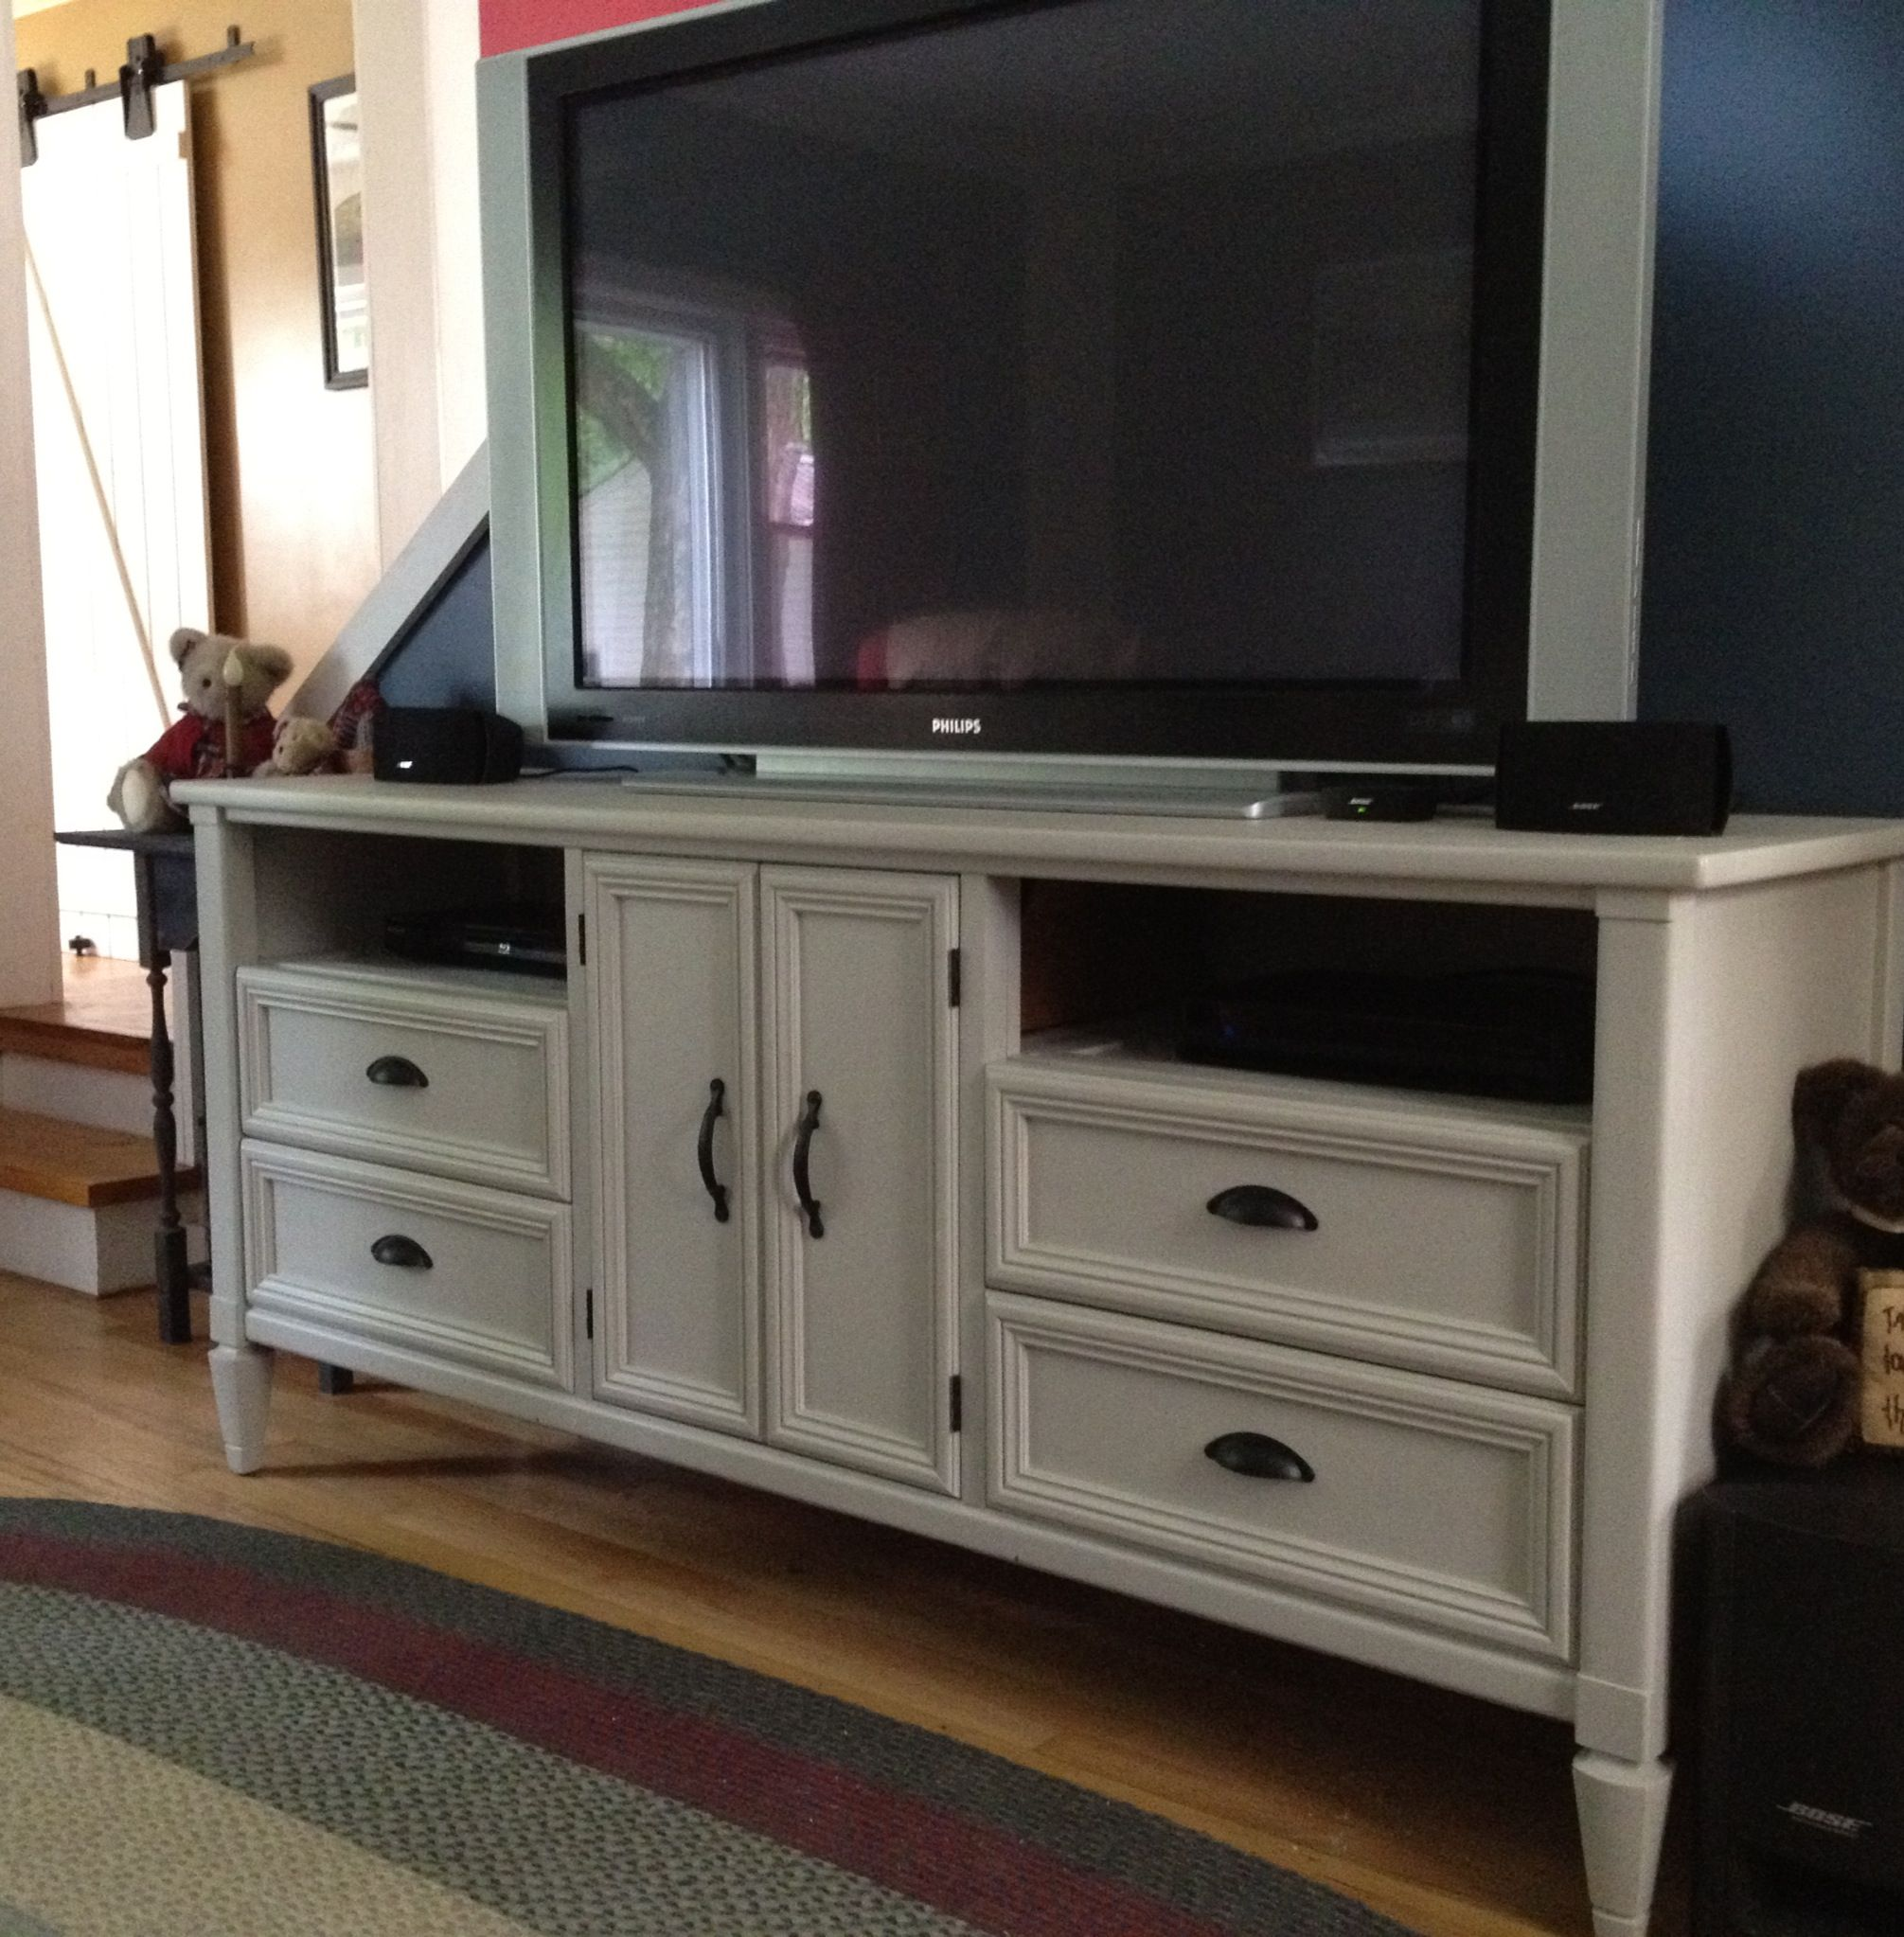 Dresser Turned Tv Stand 45 Craigslist Dresser 20 In New Hardware